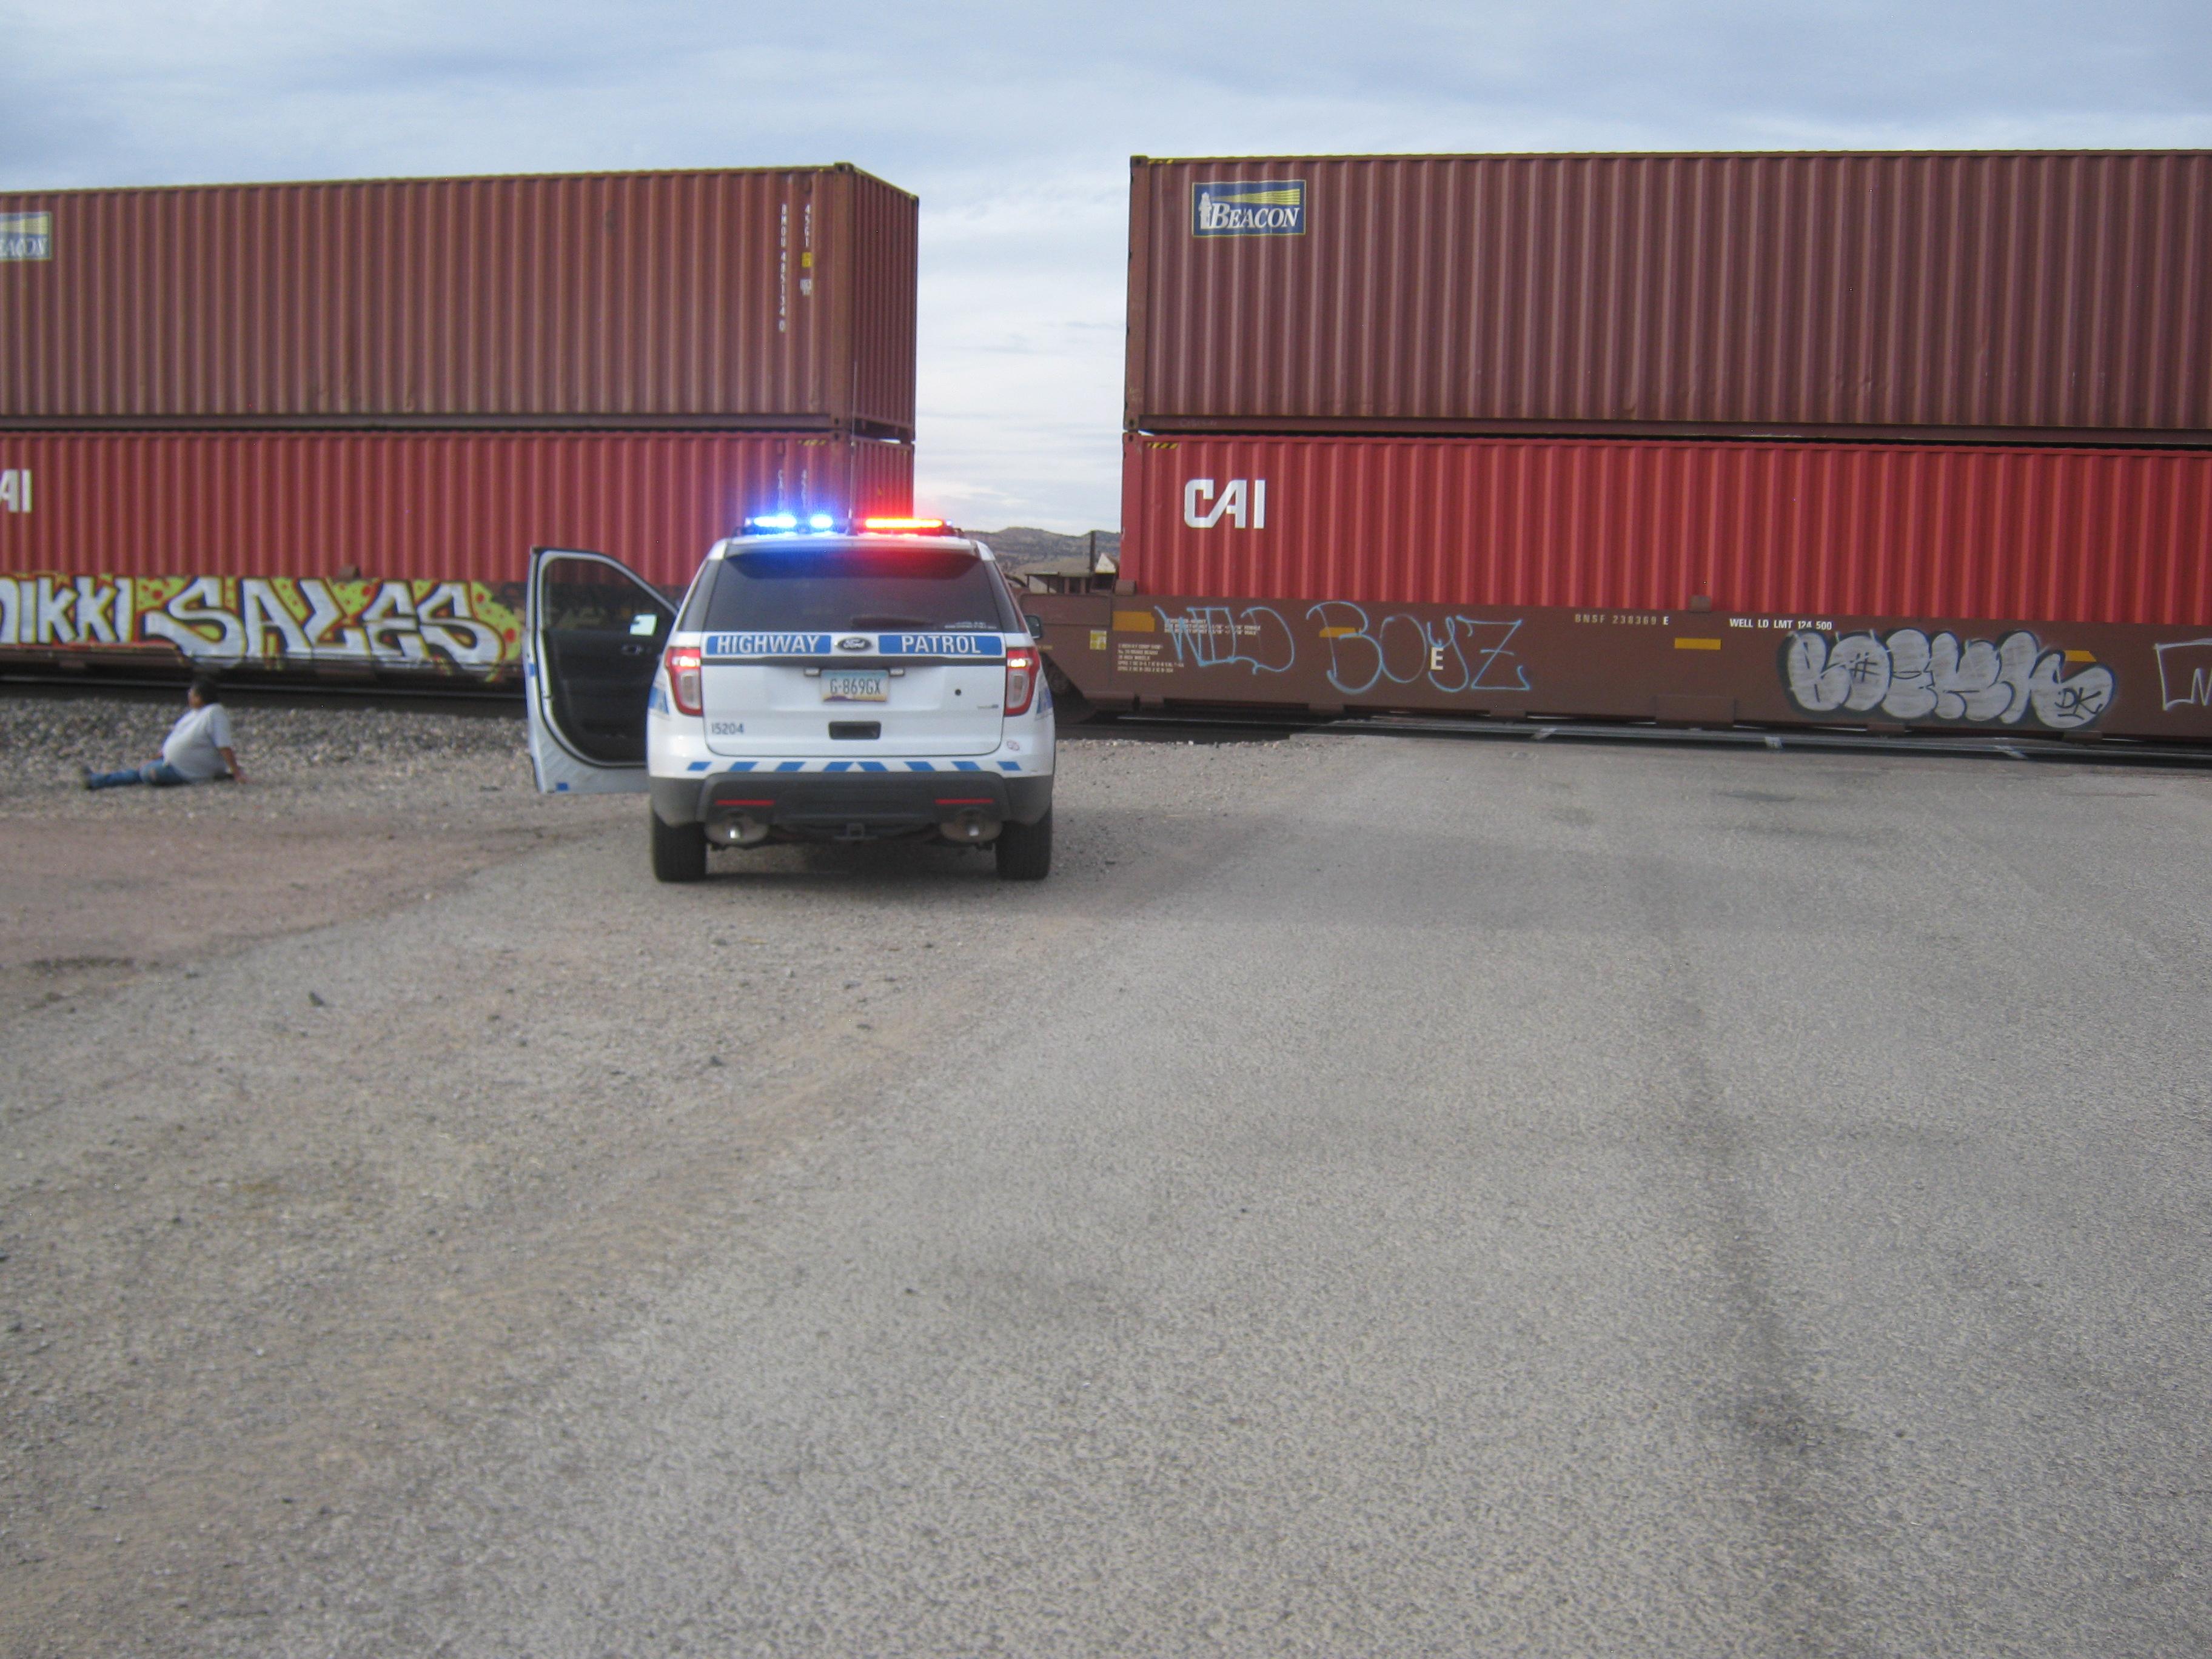 trooper car and train